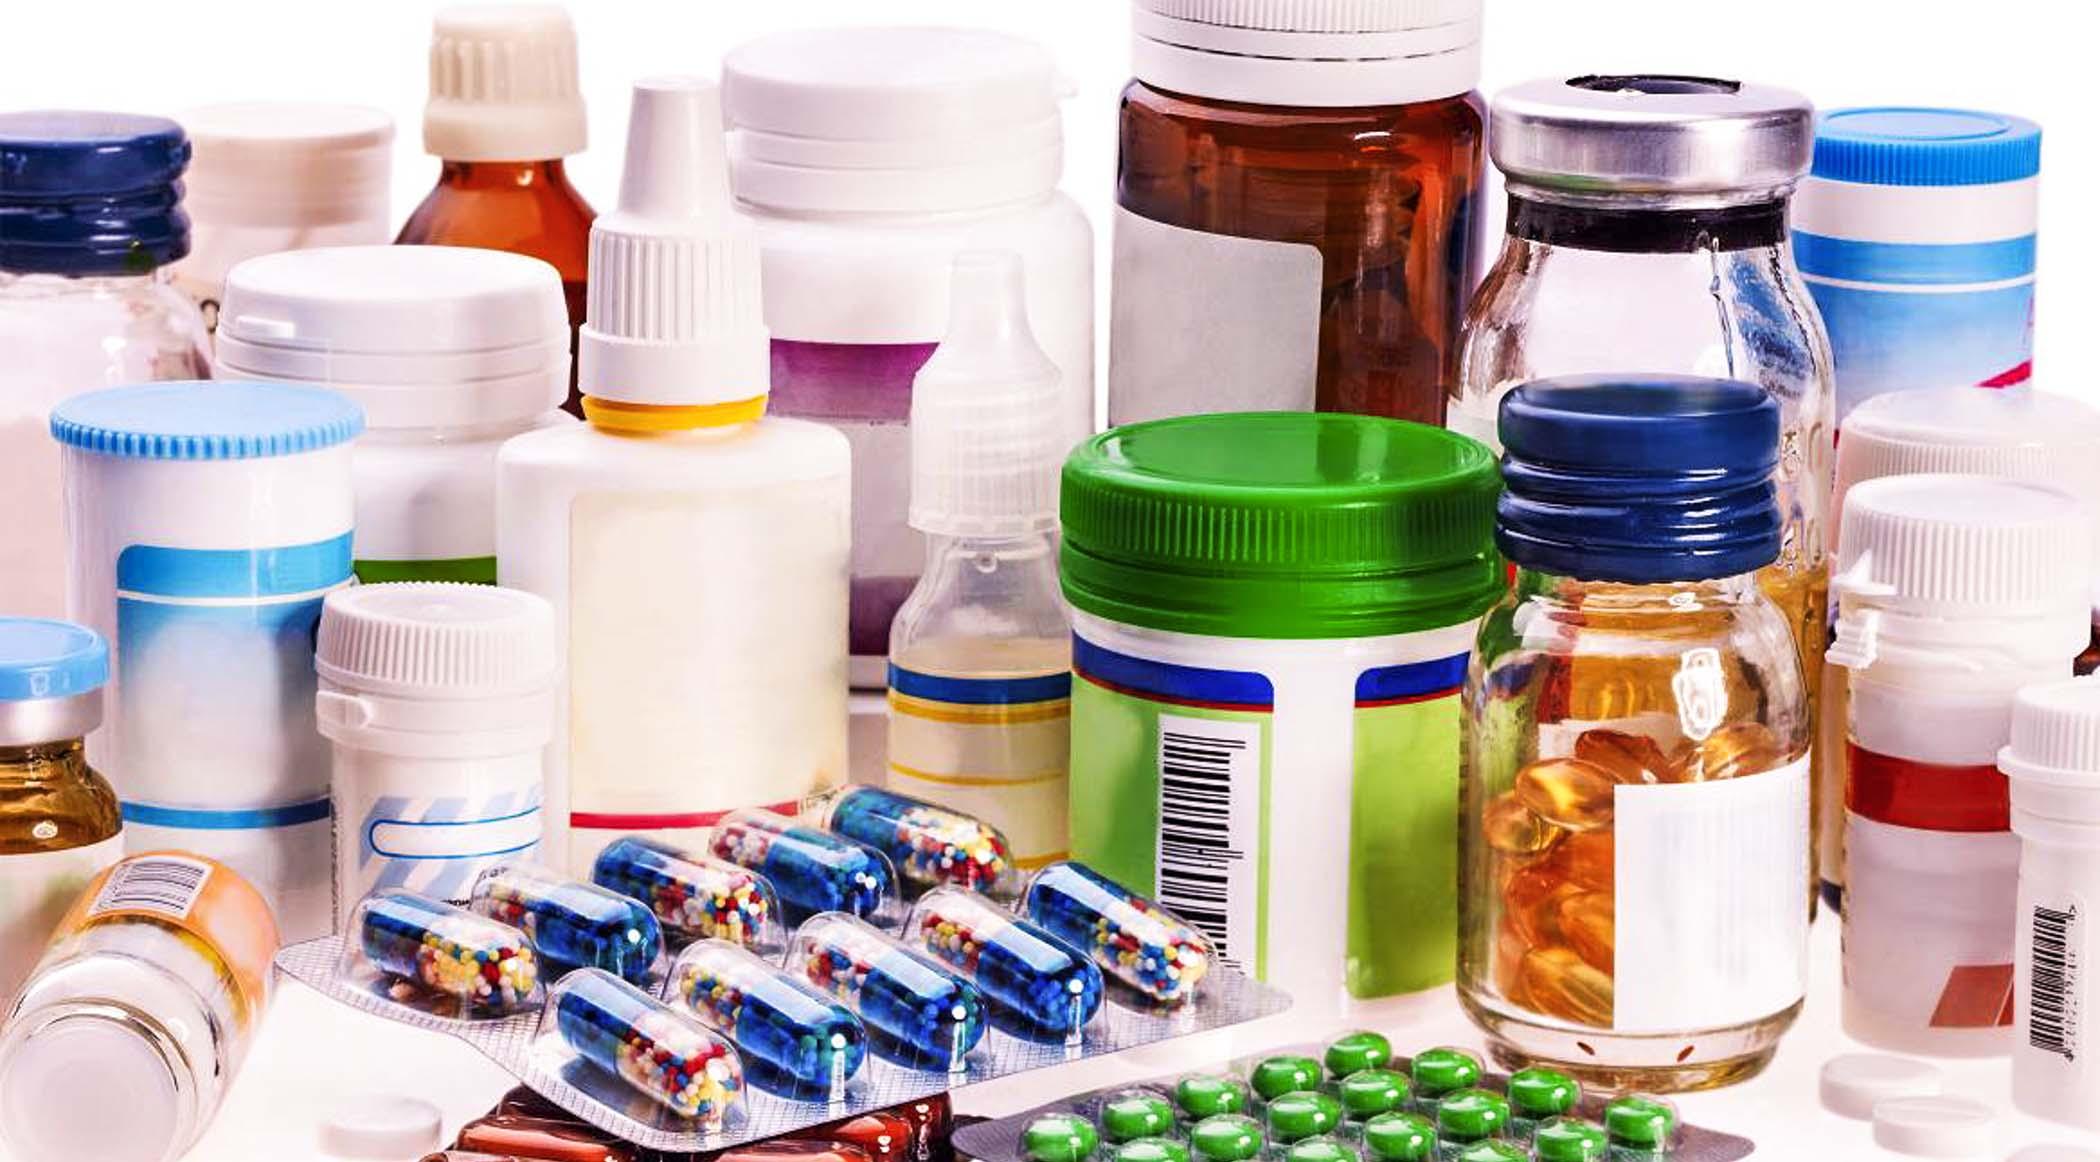 Retoman investigación de medicamentos apócrifos